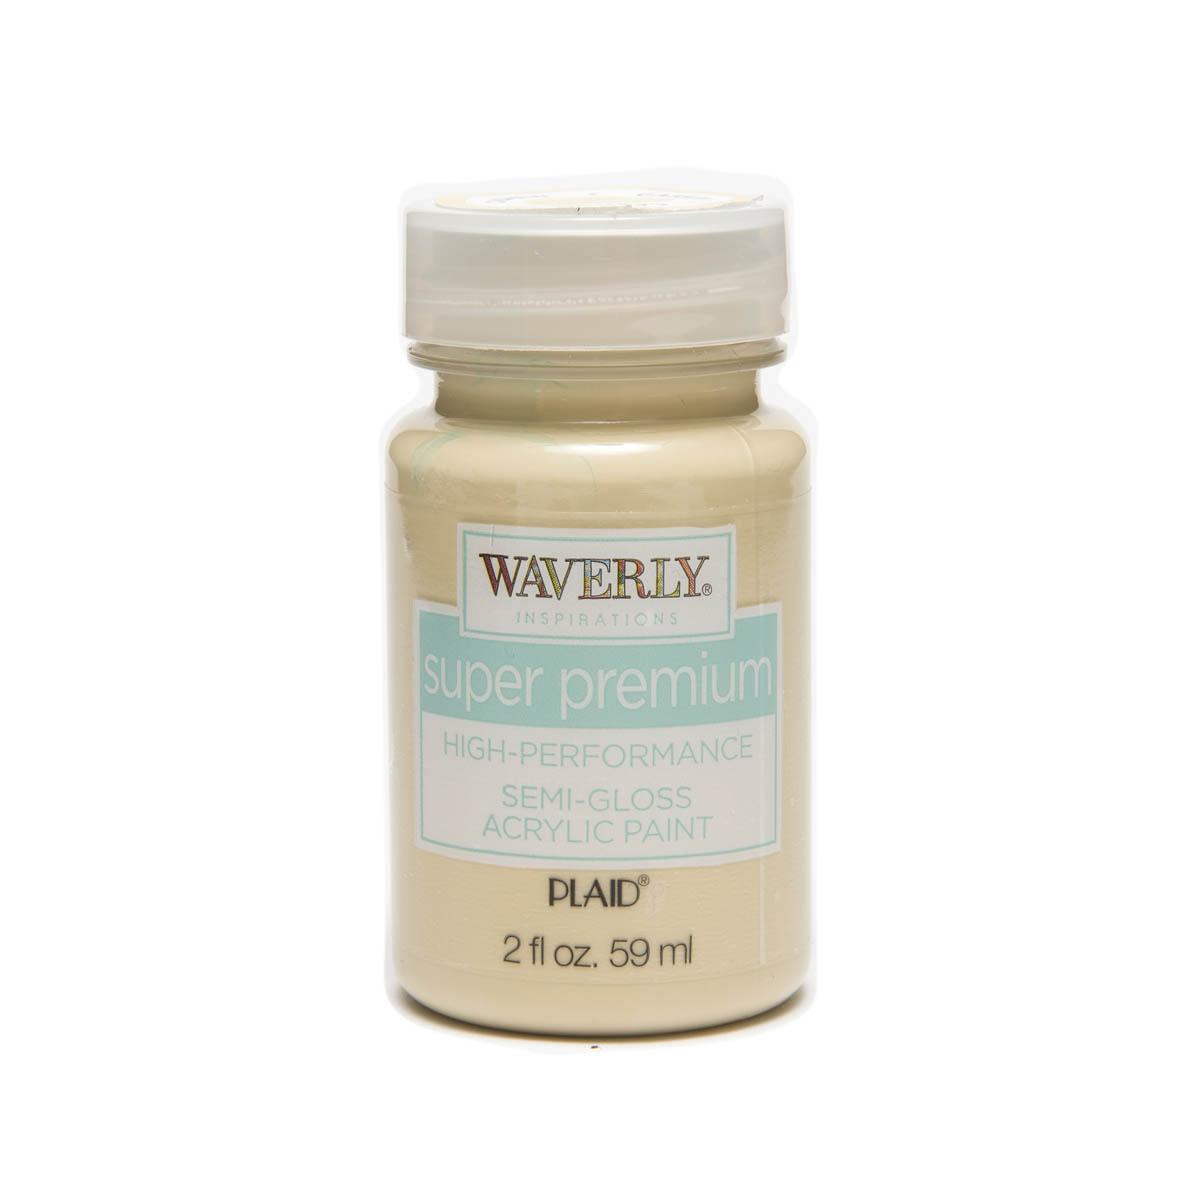 Waverly ® Inspirations Super Premium Semi-Gloss Acrylic Paint - Cashew, 2 oz.